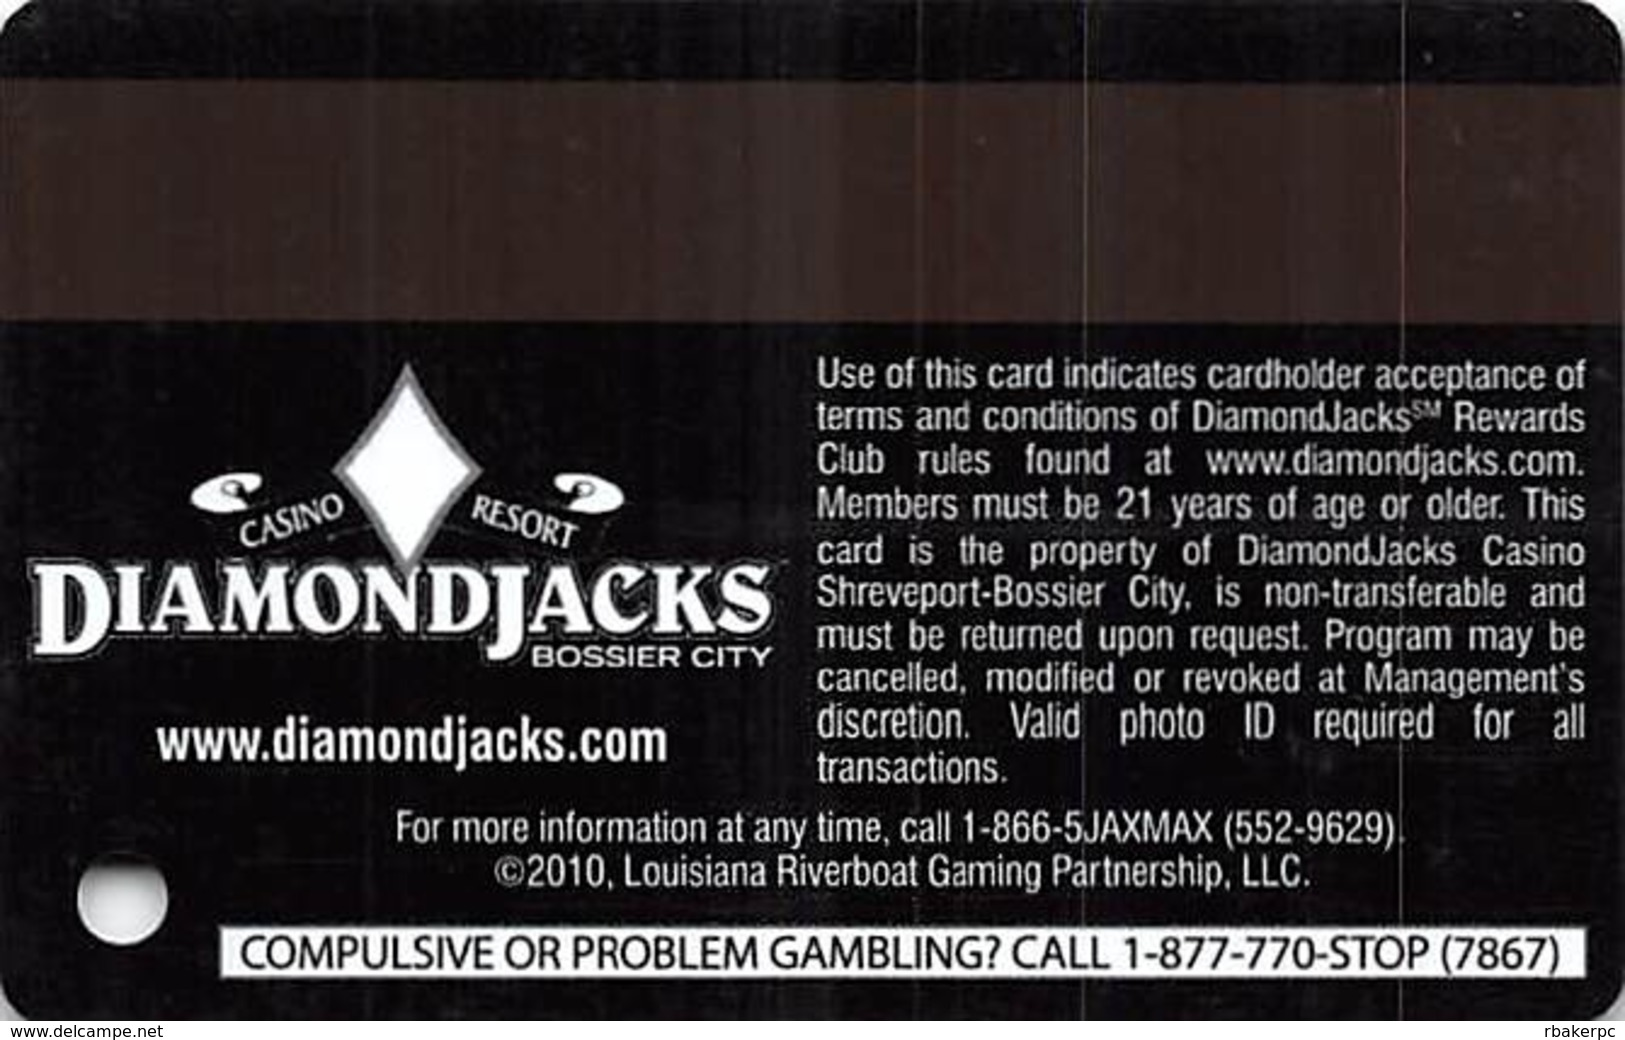 Diamond Jack's Casino Bossier City, LA - Slot Card - Copyright 2010 On Second Line From Bottom - Casino Cards